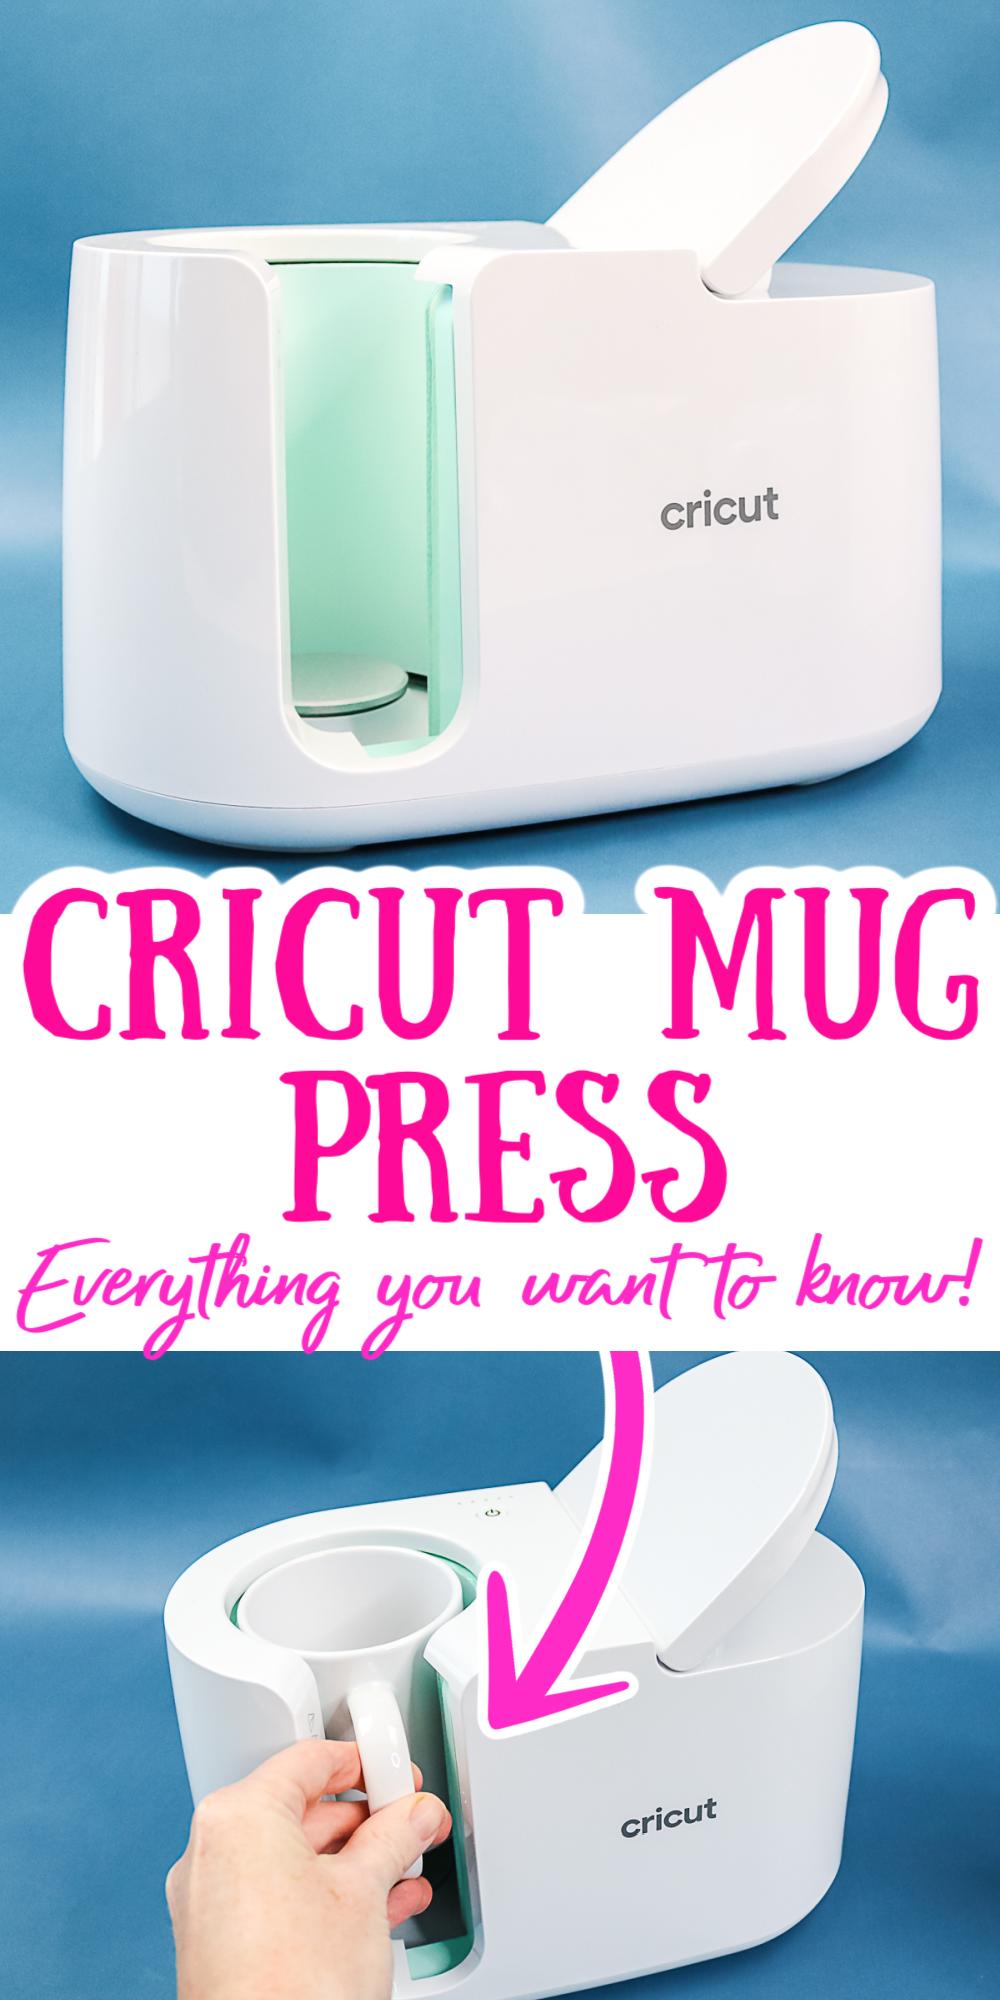 mug press from cricut